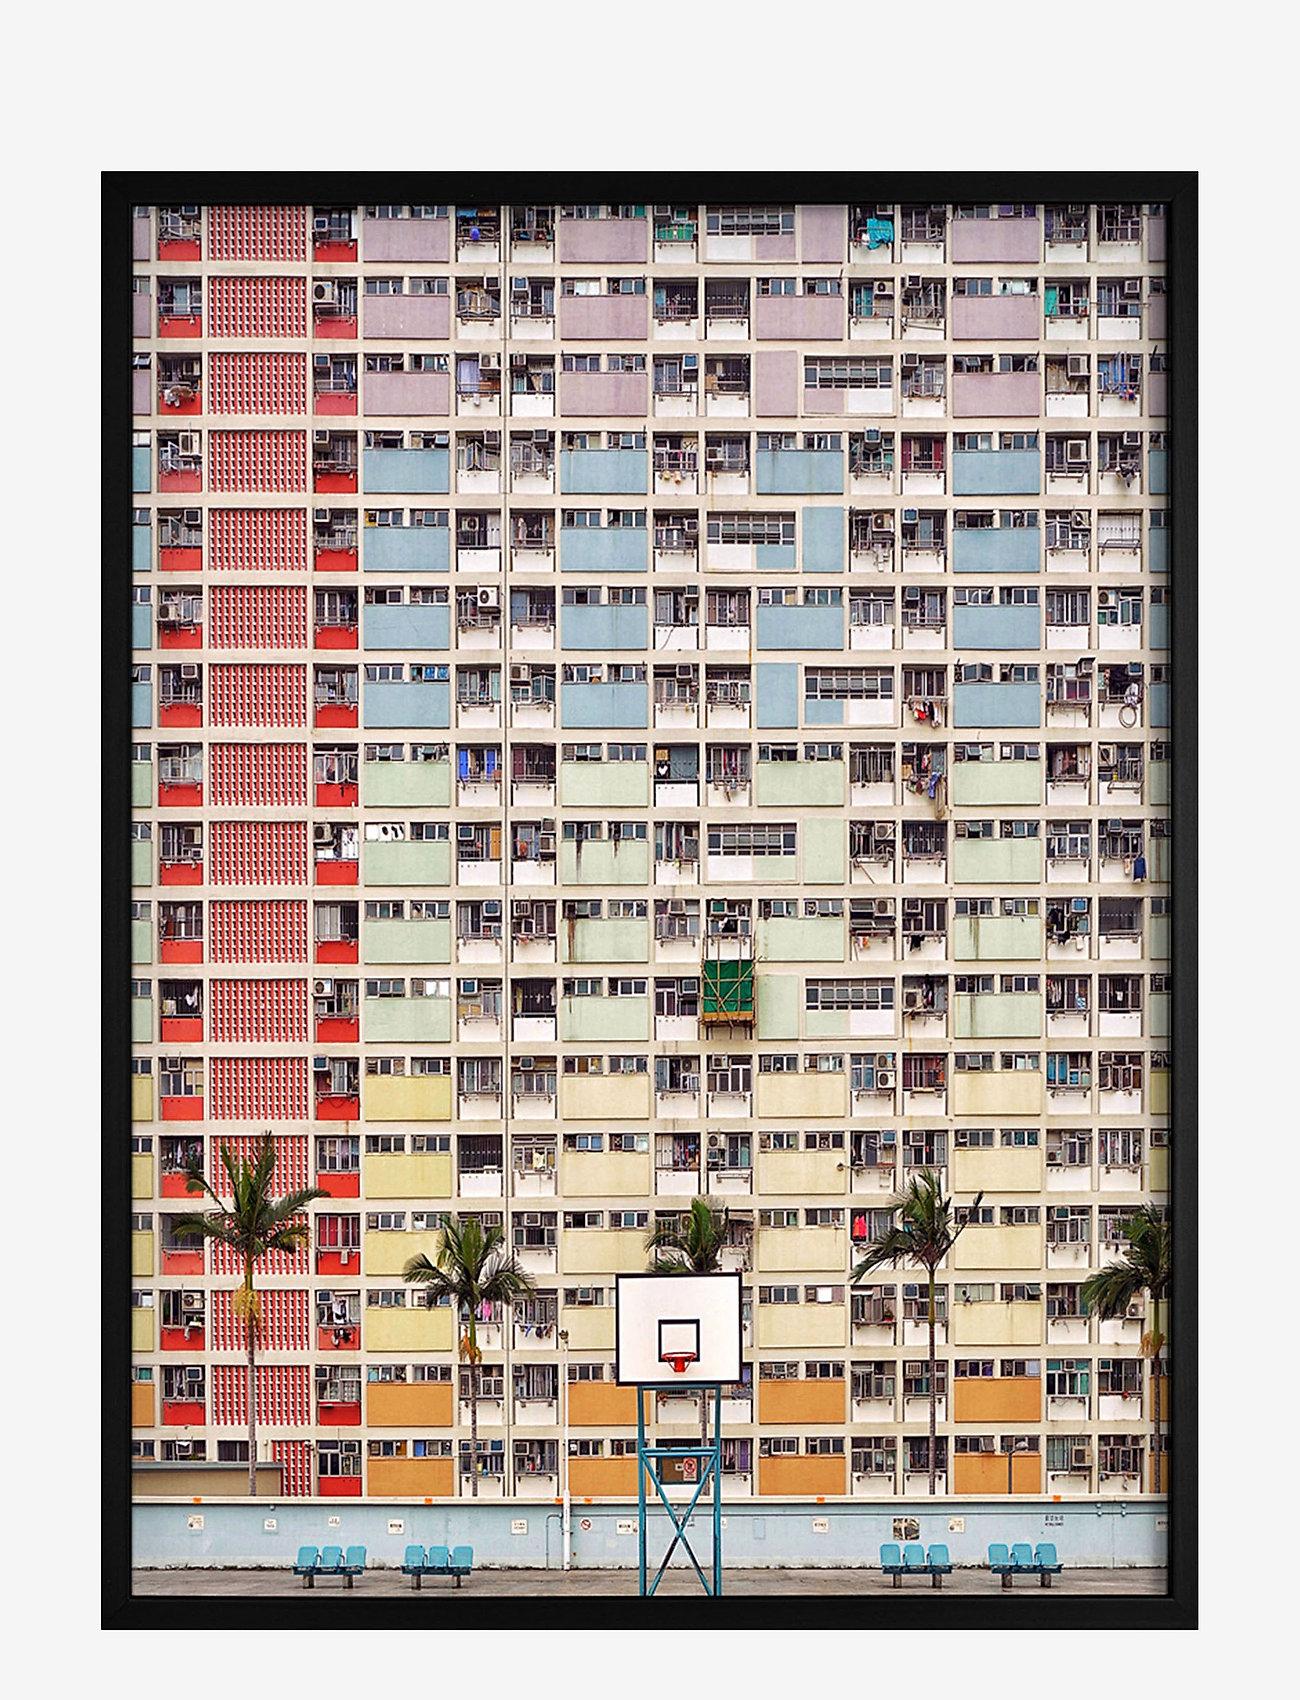 Democratic Gallery - Poster Colorful Architecture - home decor - red - 0